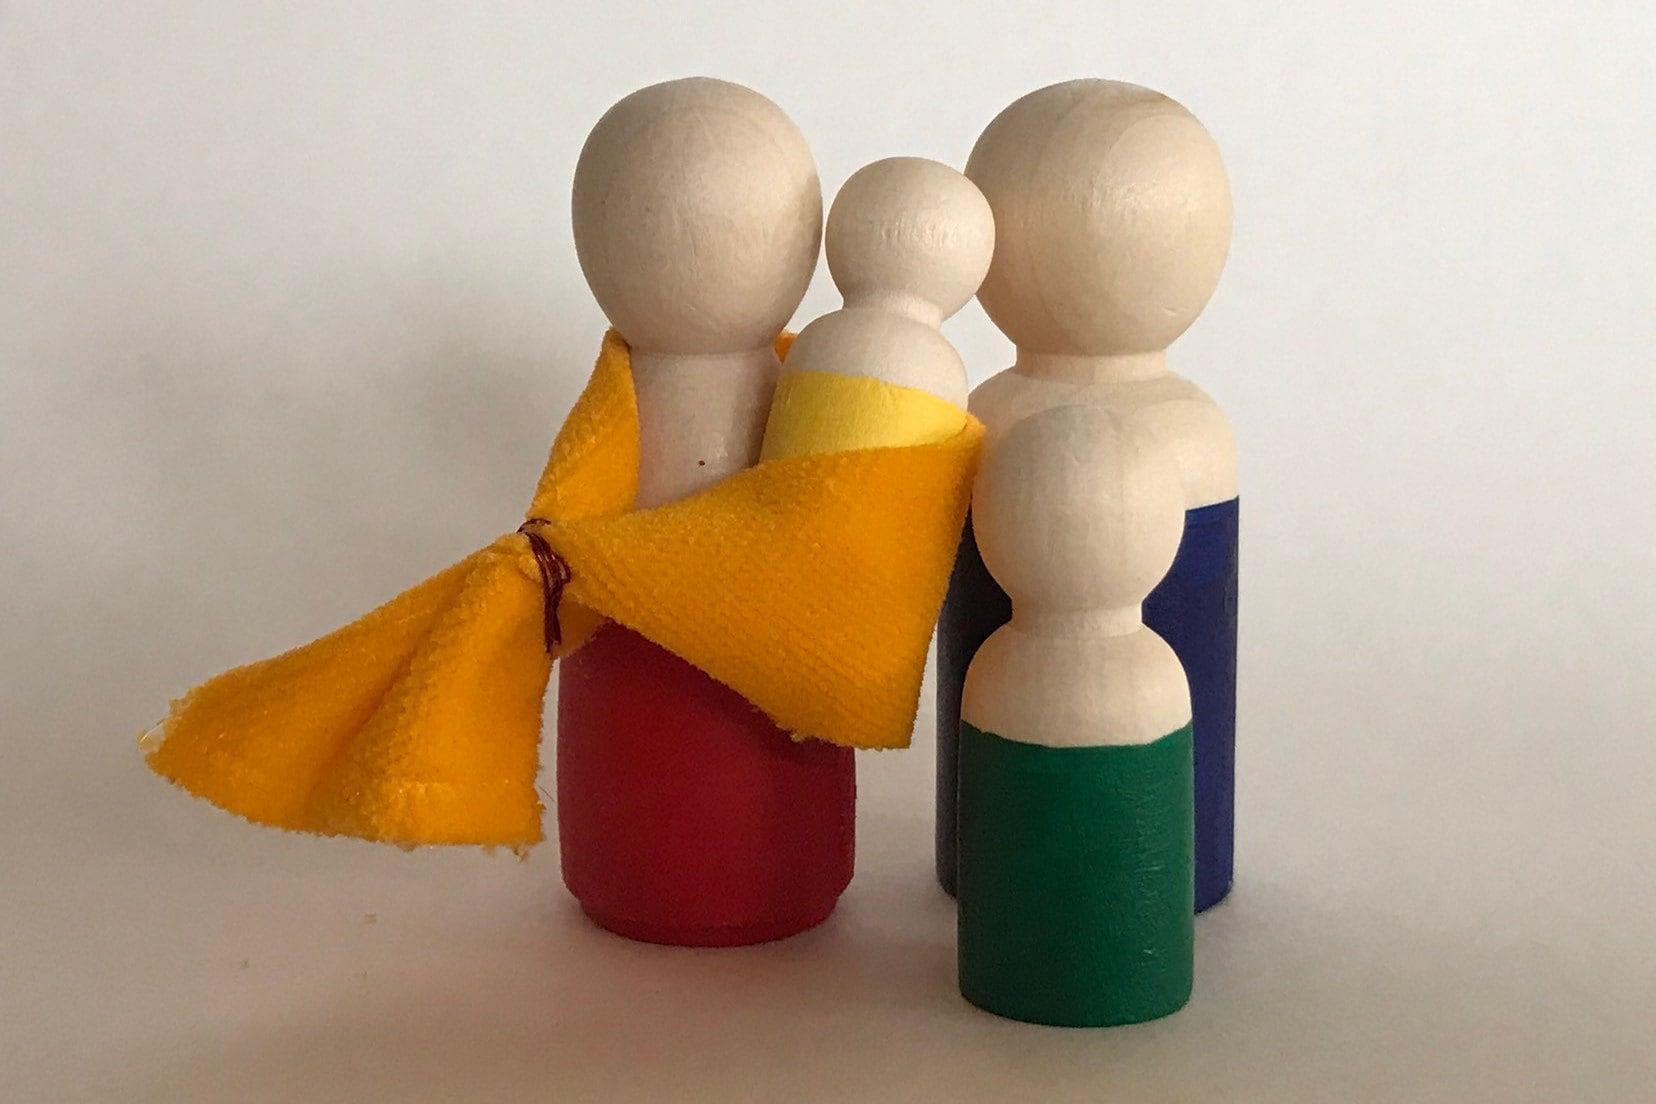 Wooden peg Doll Family of 8 Montessori